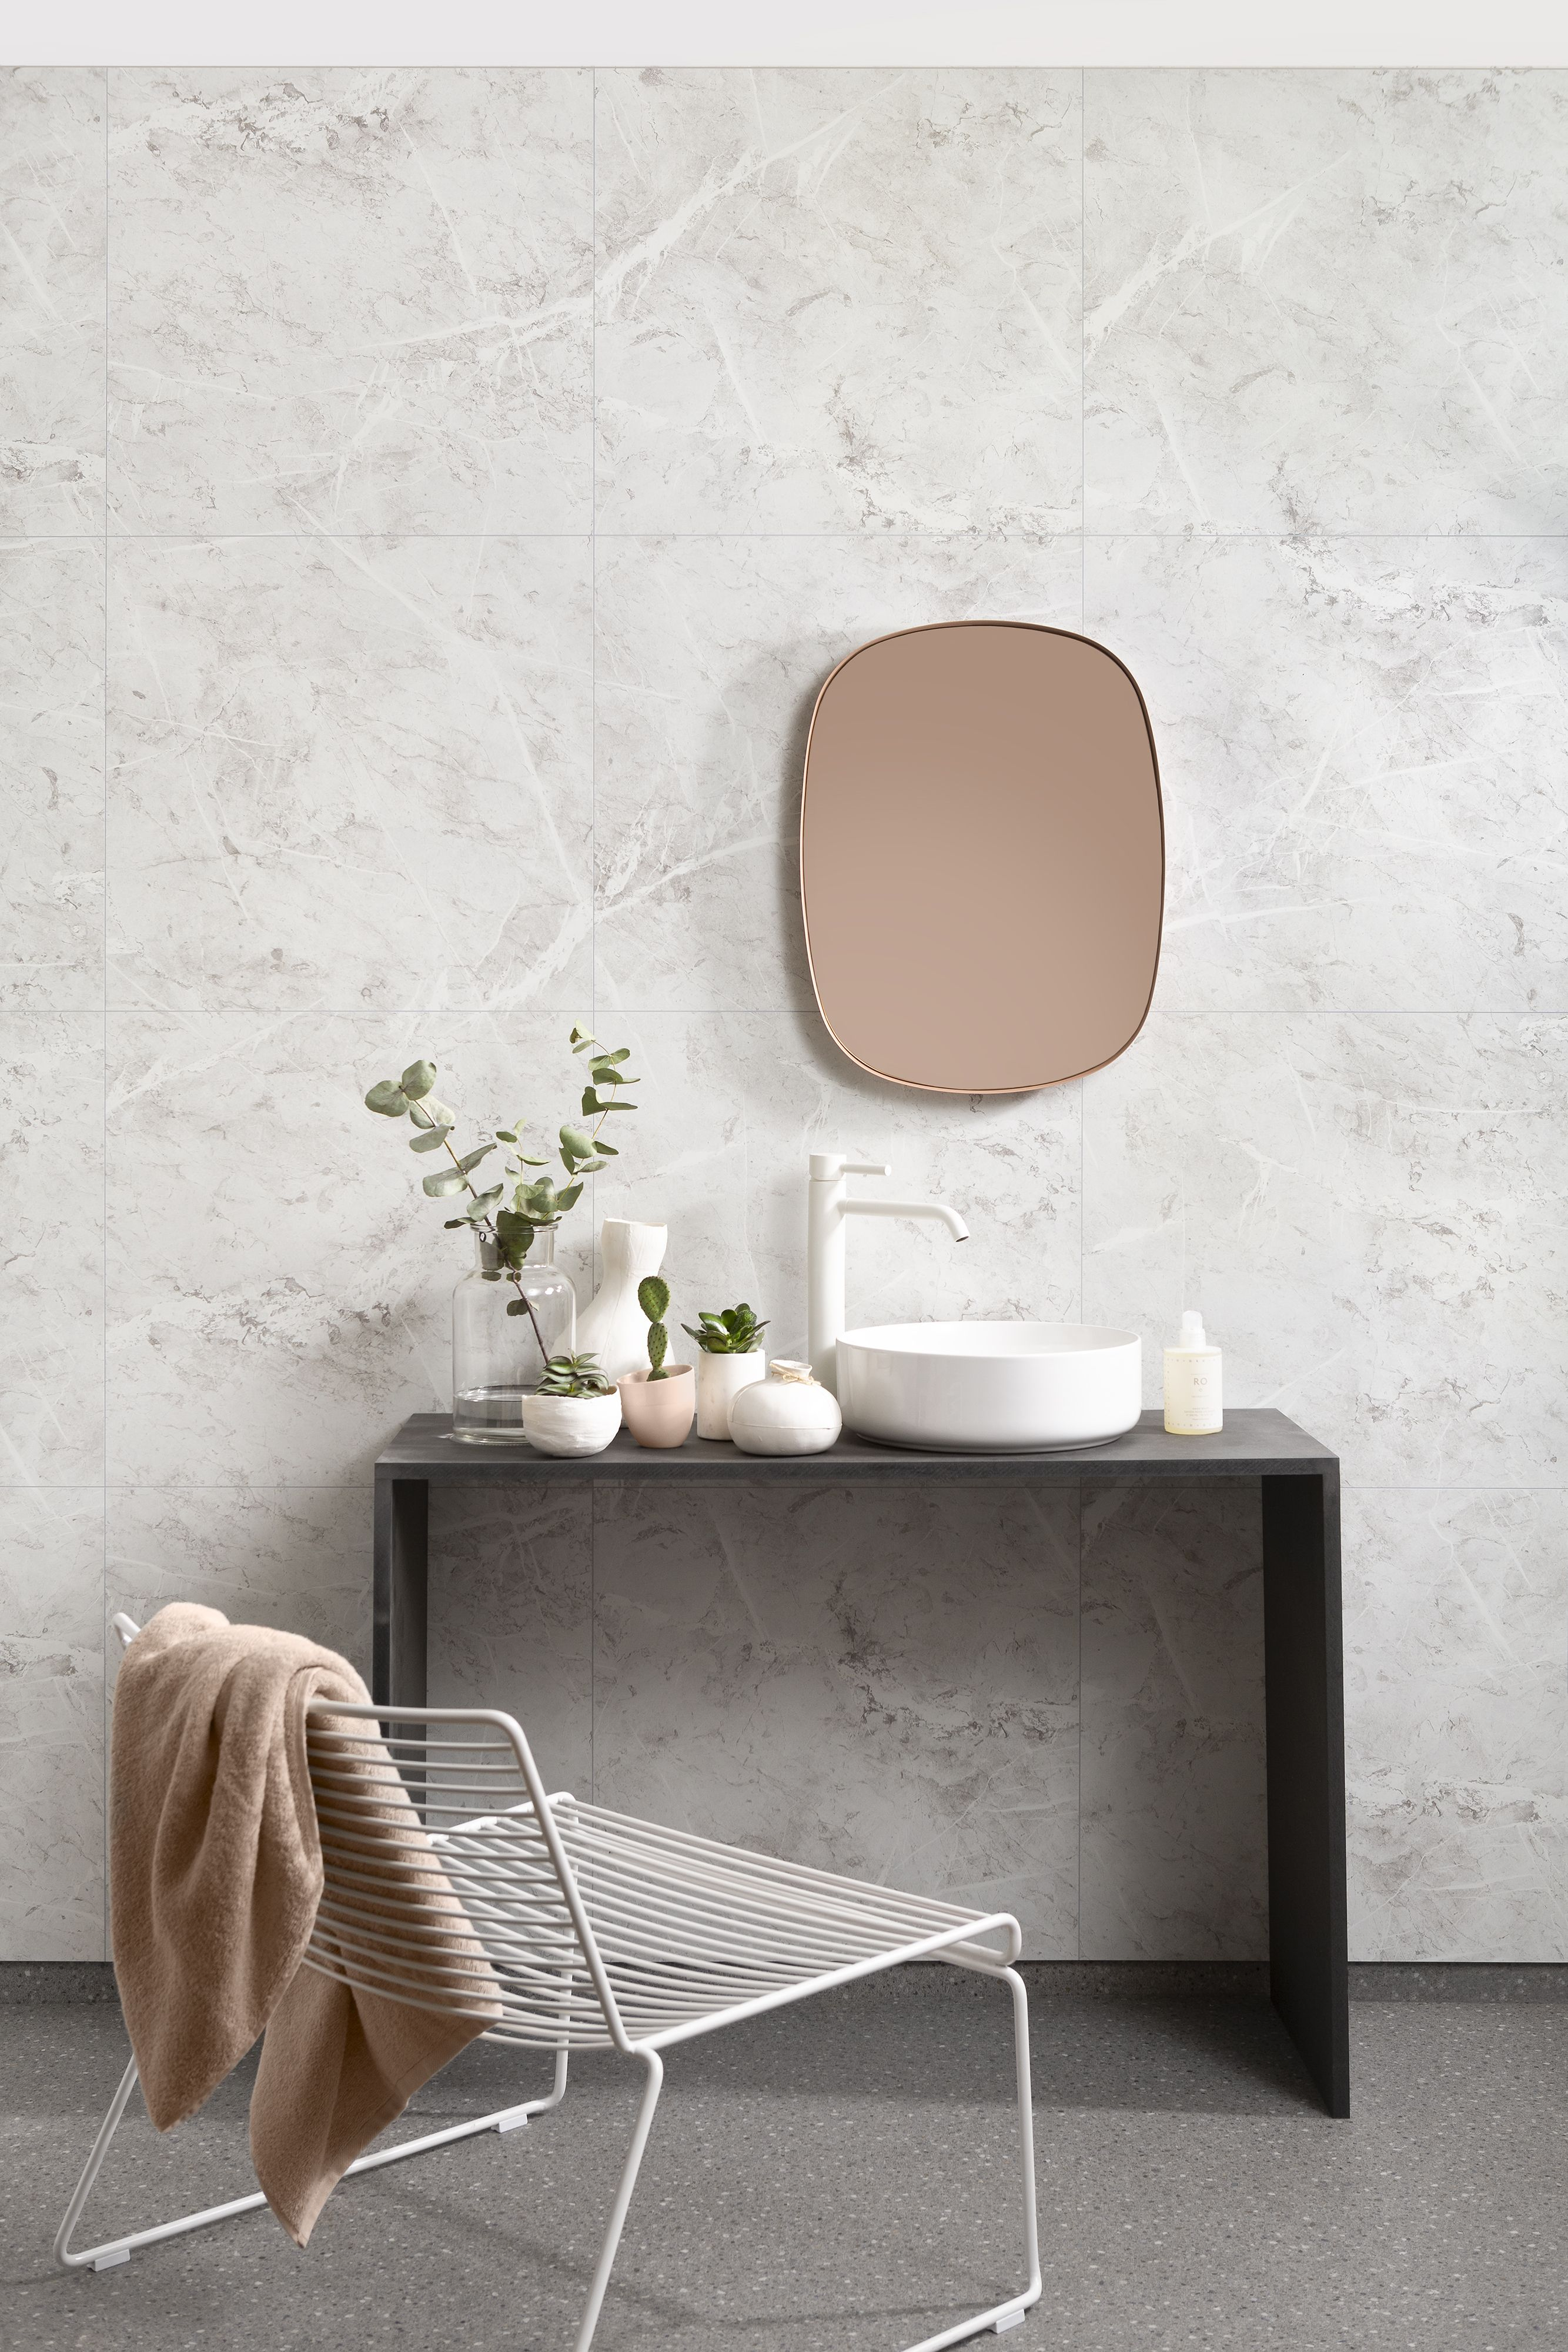 Fibo Wall Panel White Marble White Paneling Wall Panels Wall Paneling